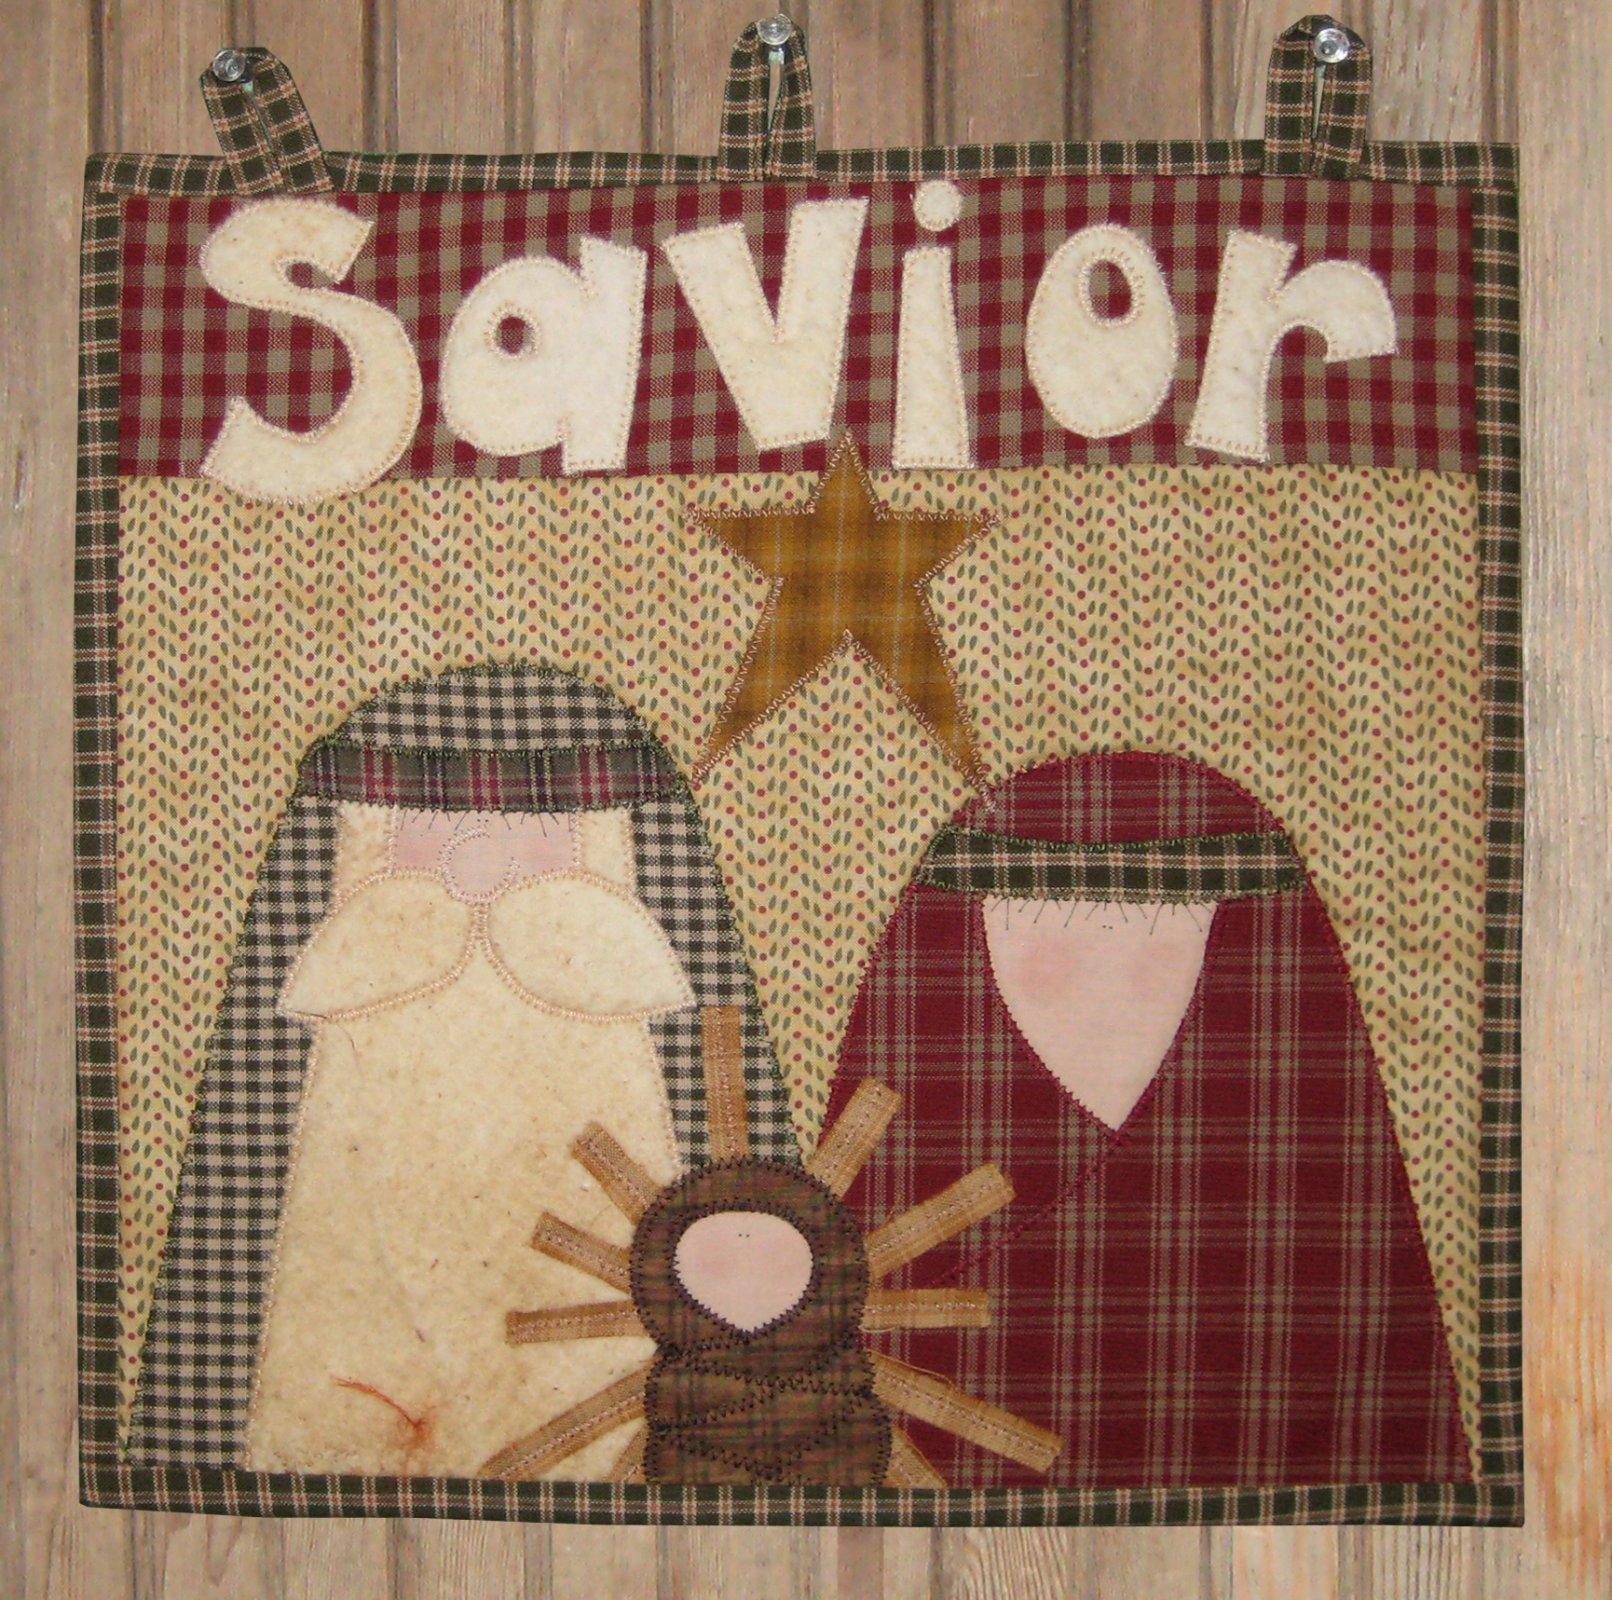 Savior Button-On Kit